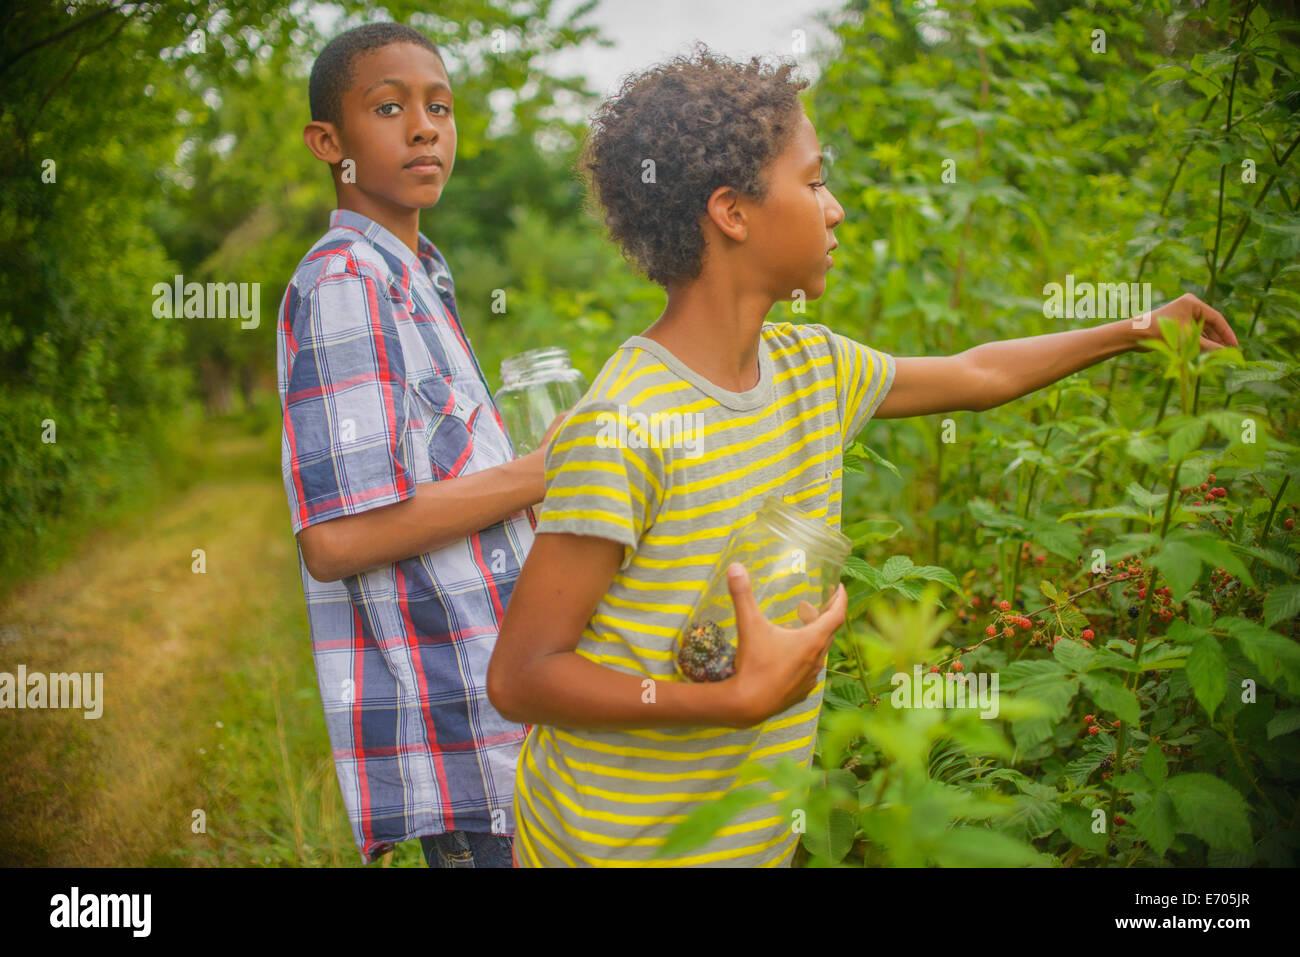 Boys picking berries - Stock Image